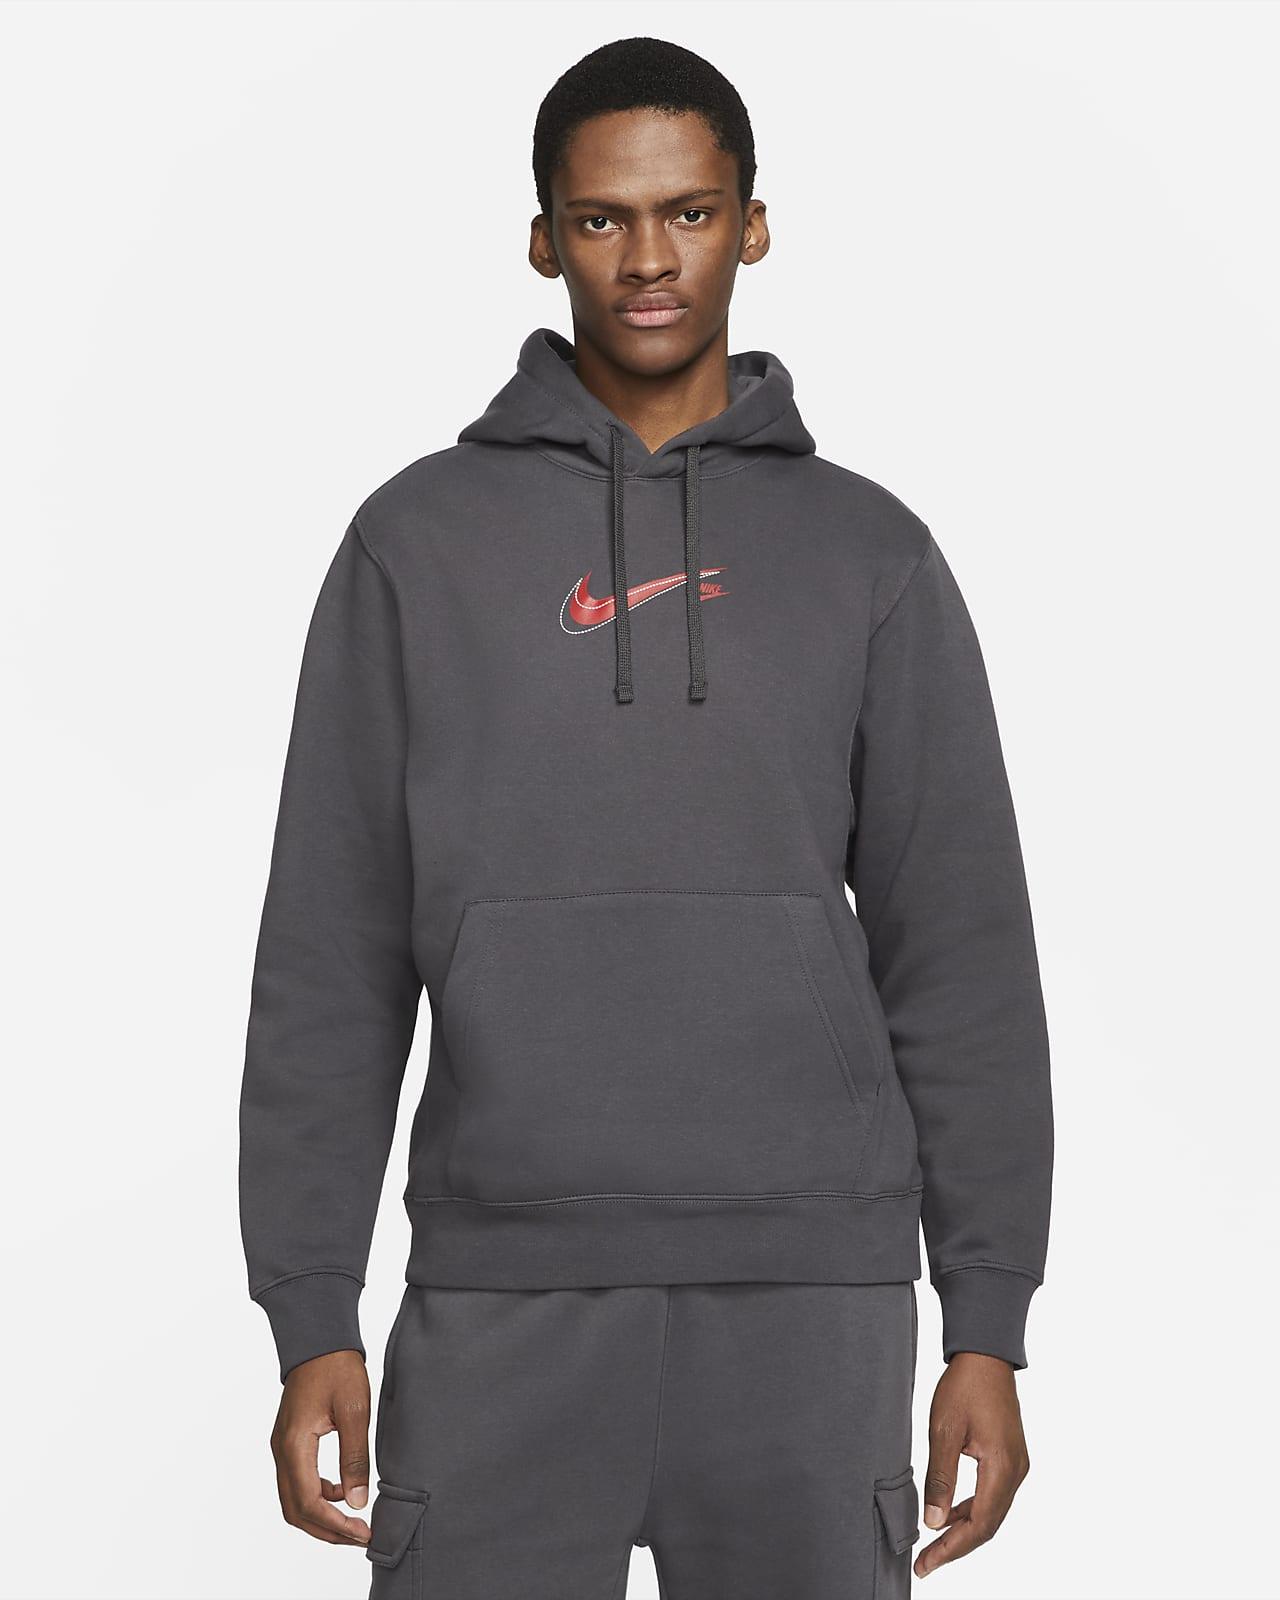 Nike Sportswear Court Fleece-Hoodie für Herren